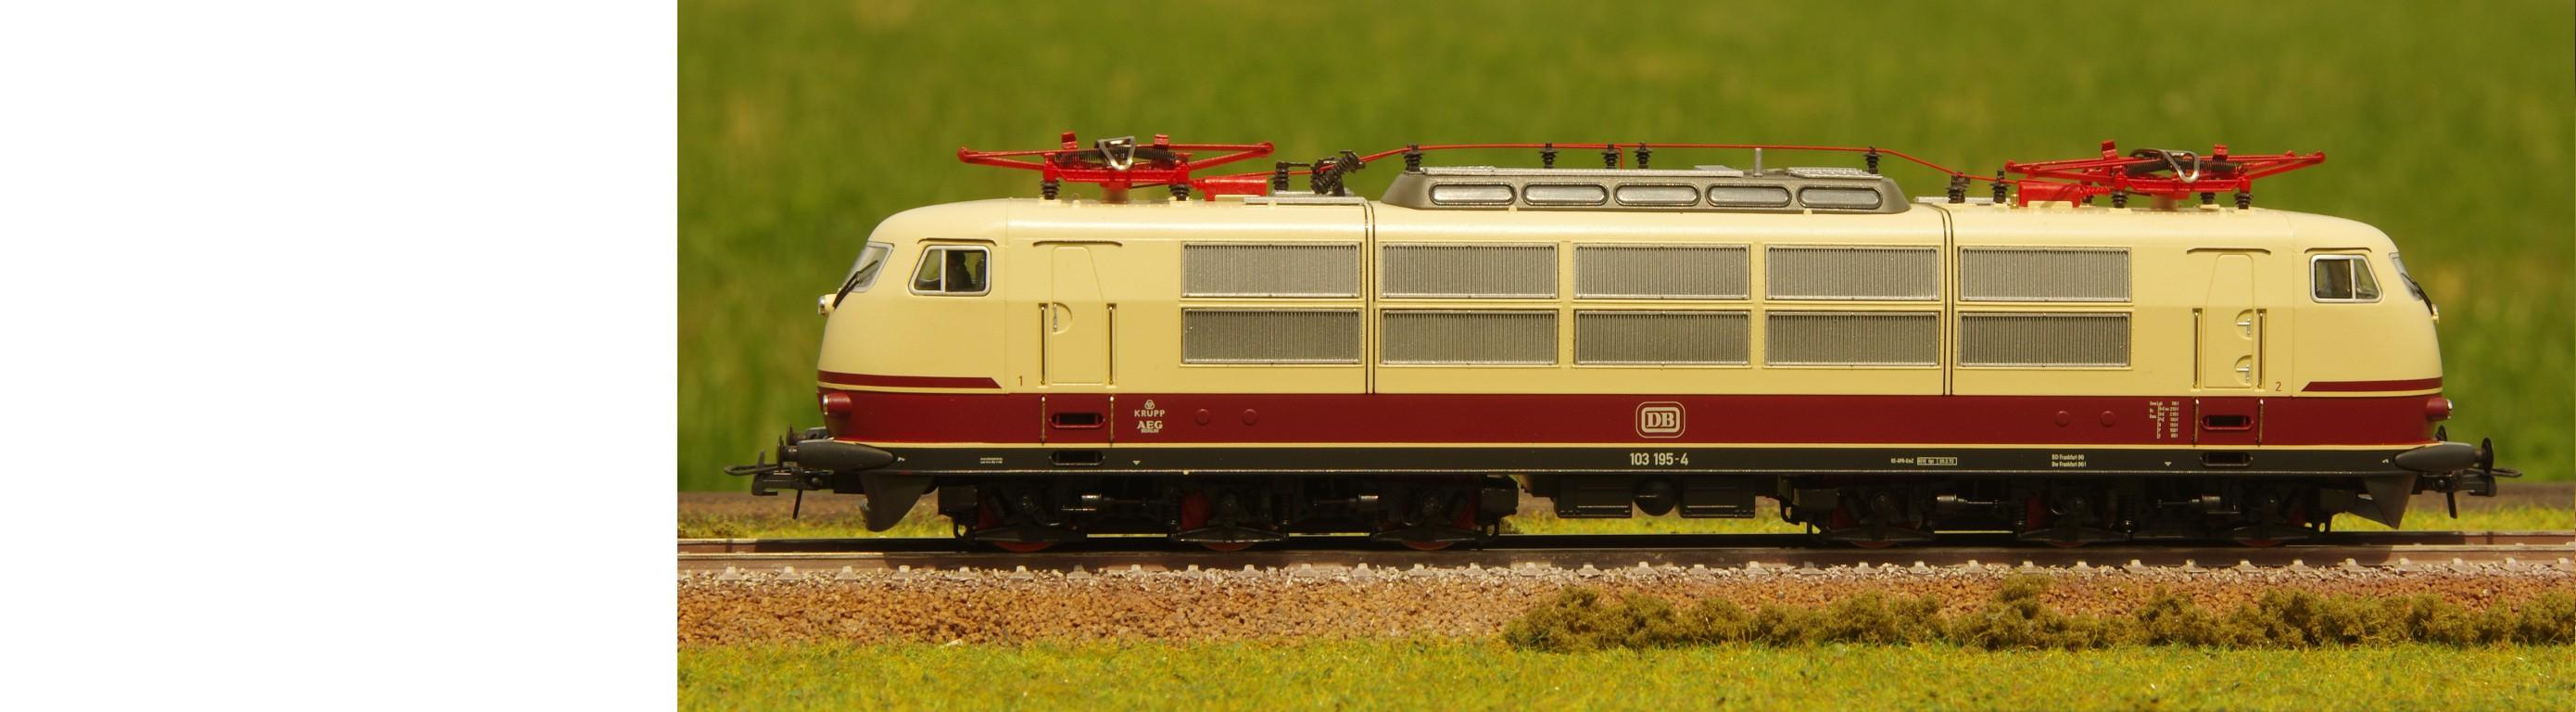 DB 103 195-4